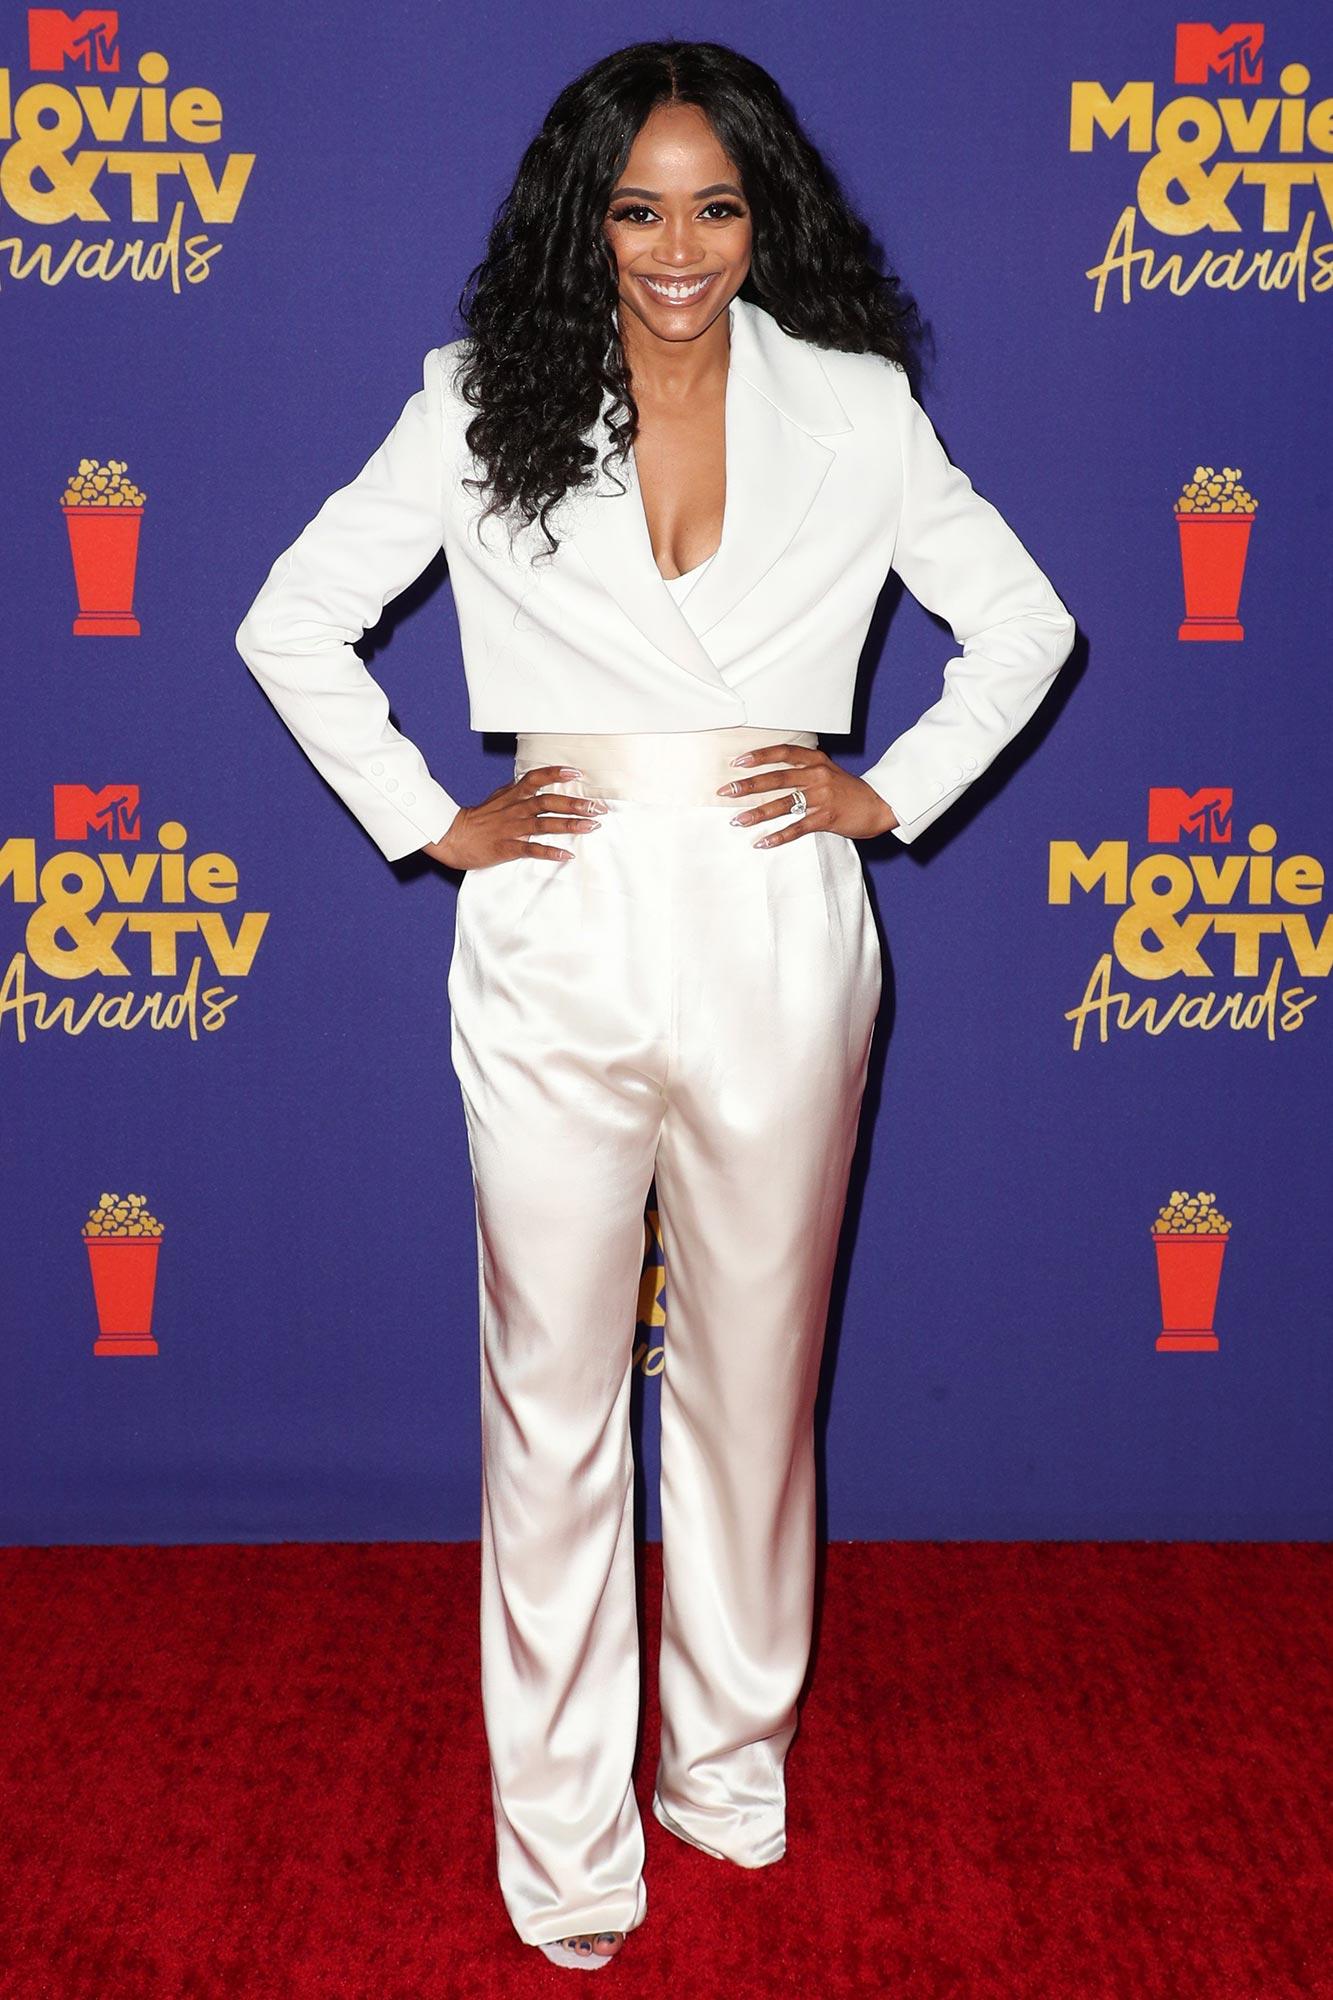 MTV Movie & TV Awards Rachel Lindsay